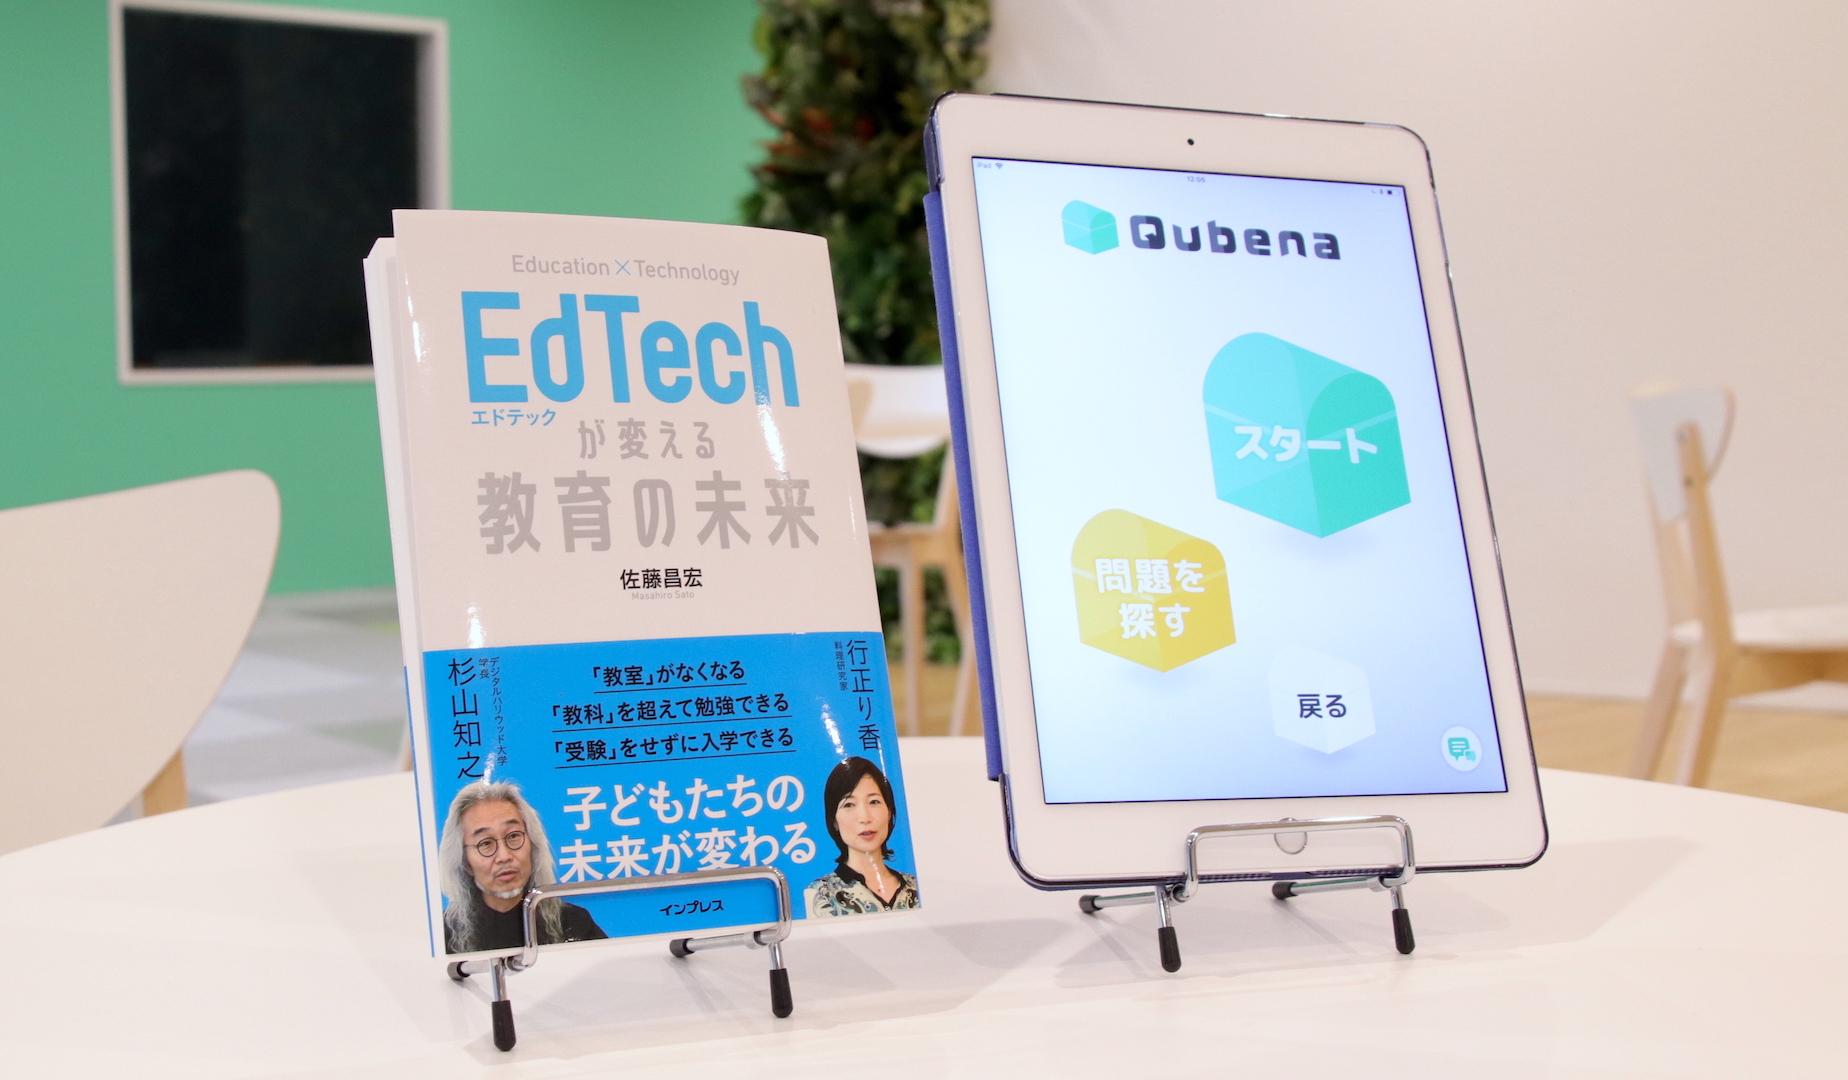 EdTechが変える教育の未来/佐藤昌宏(インプレス)表紙とQubena画面